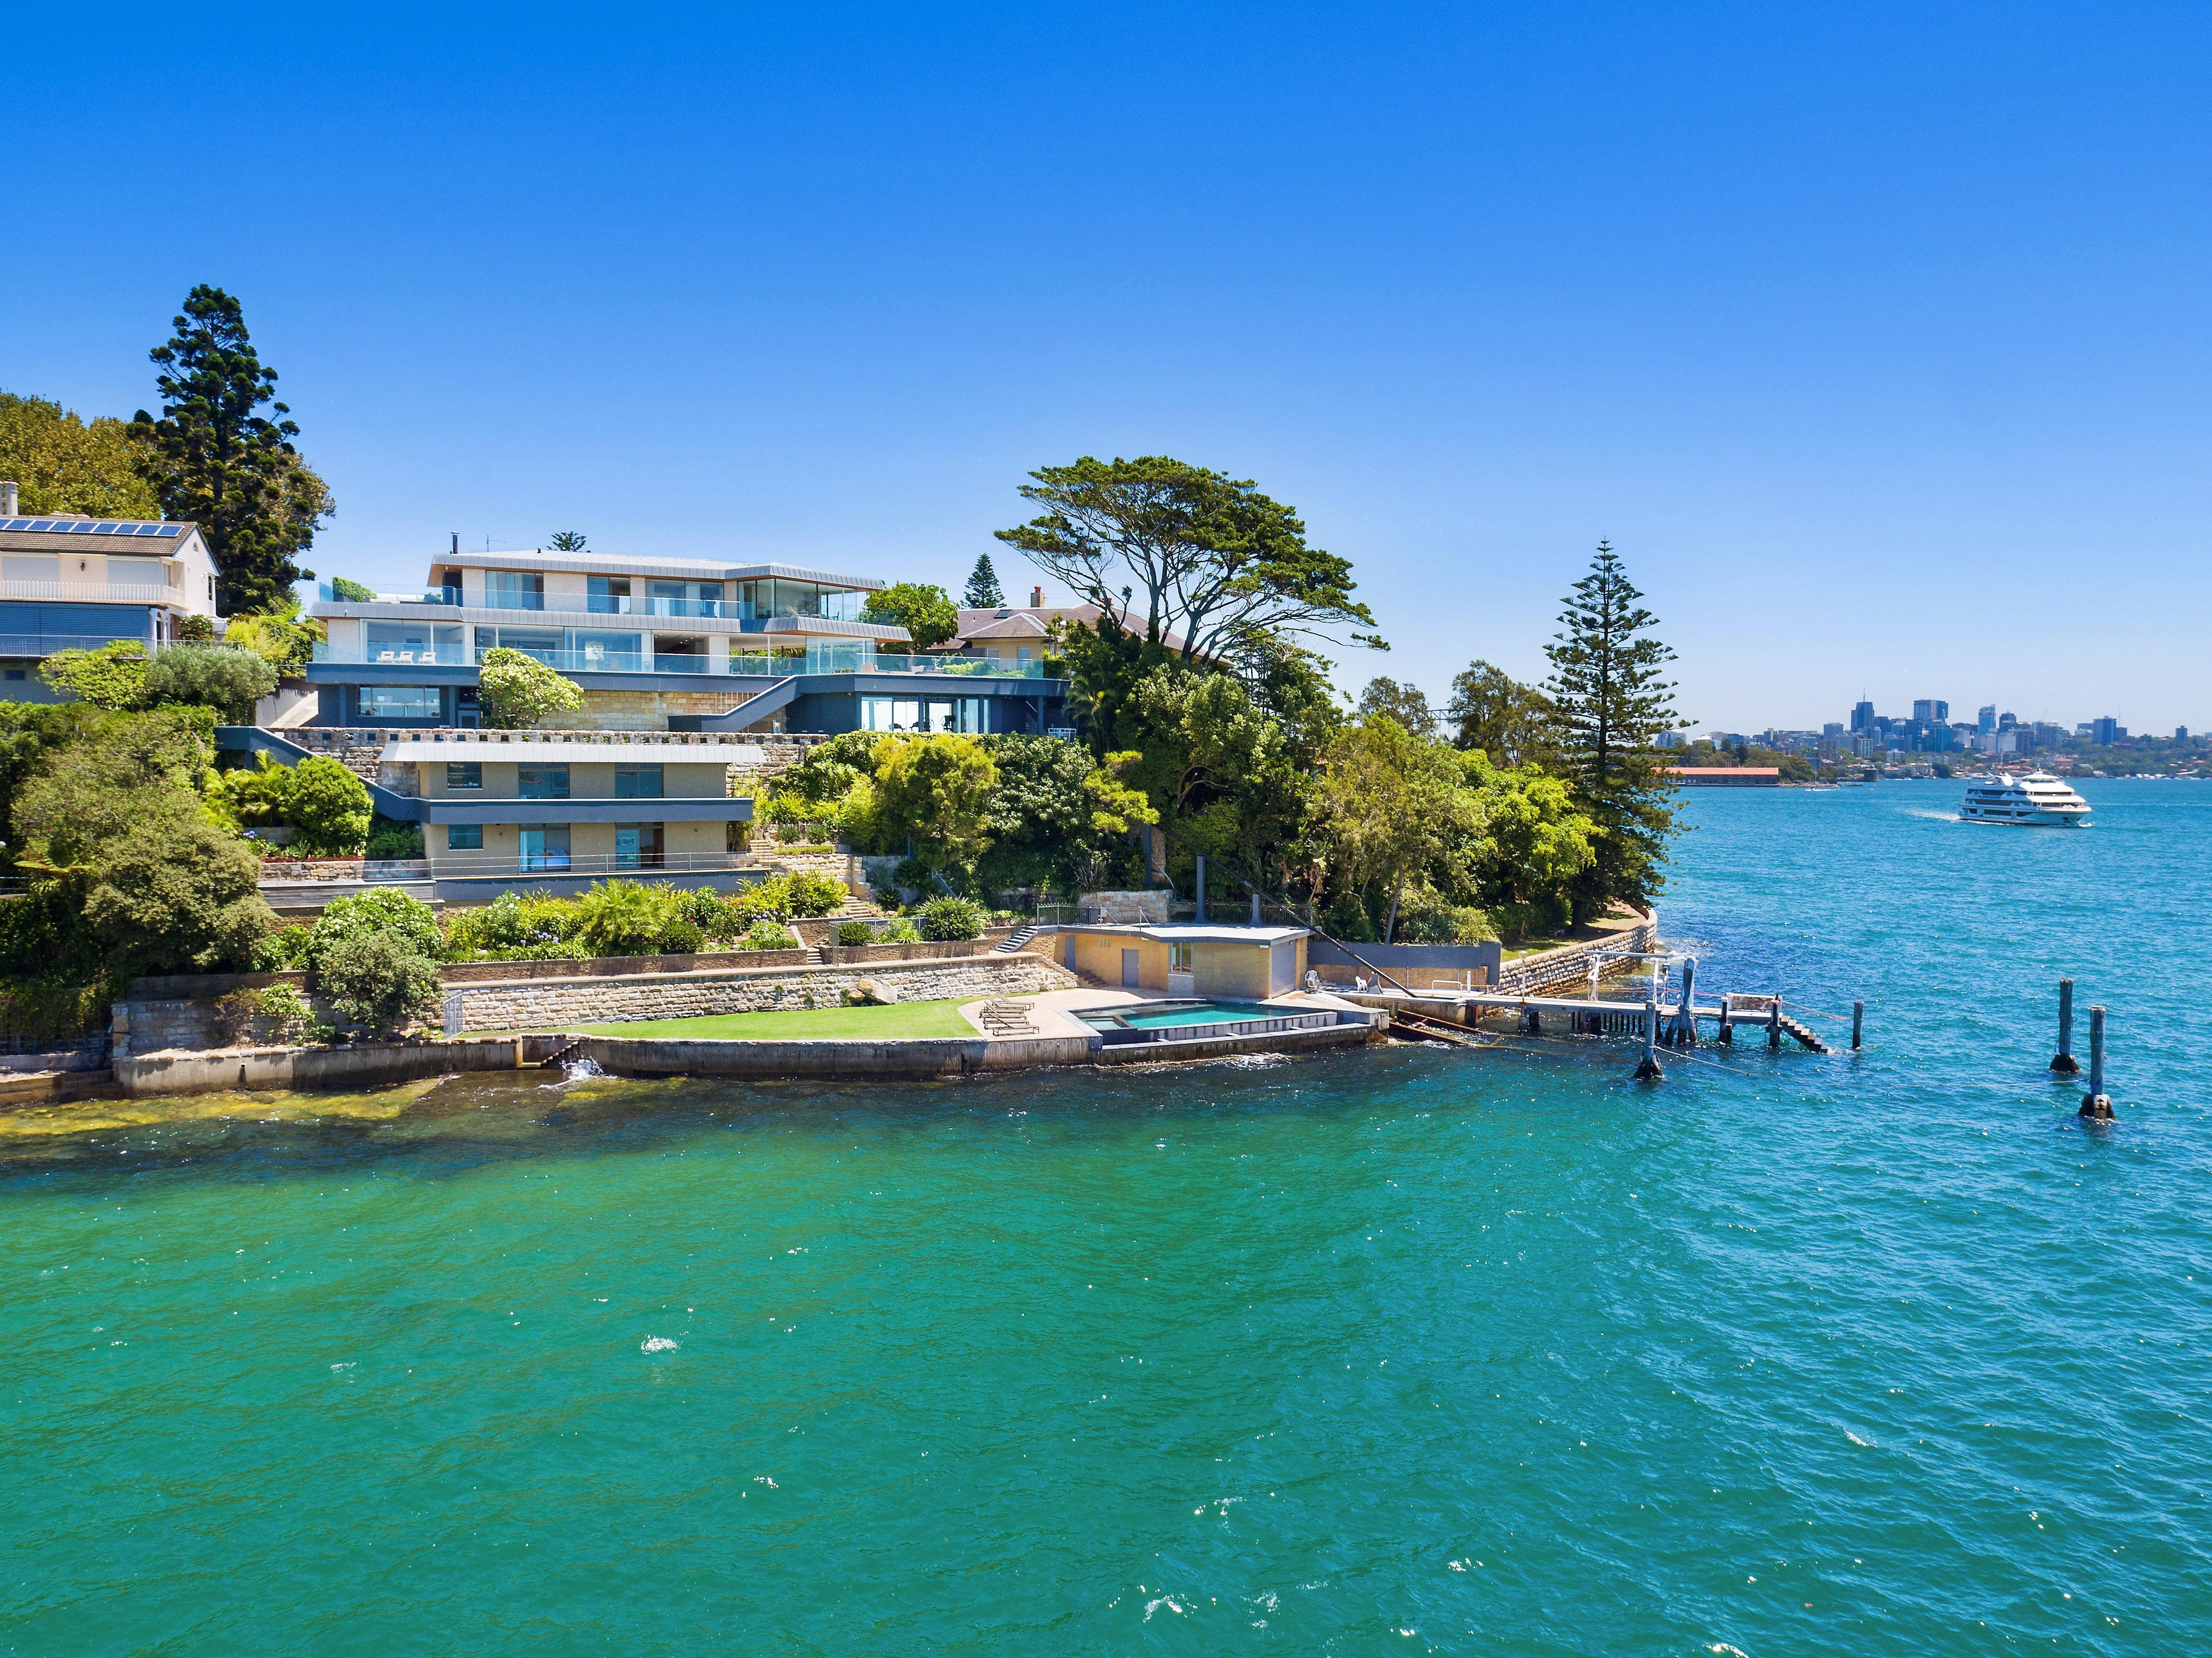 3 Lindsay Avenue,Darling Point, NSW House - For Sale - McGrath Estate Agents